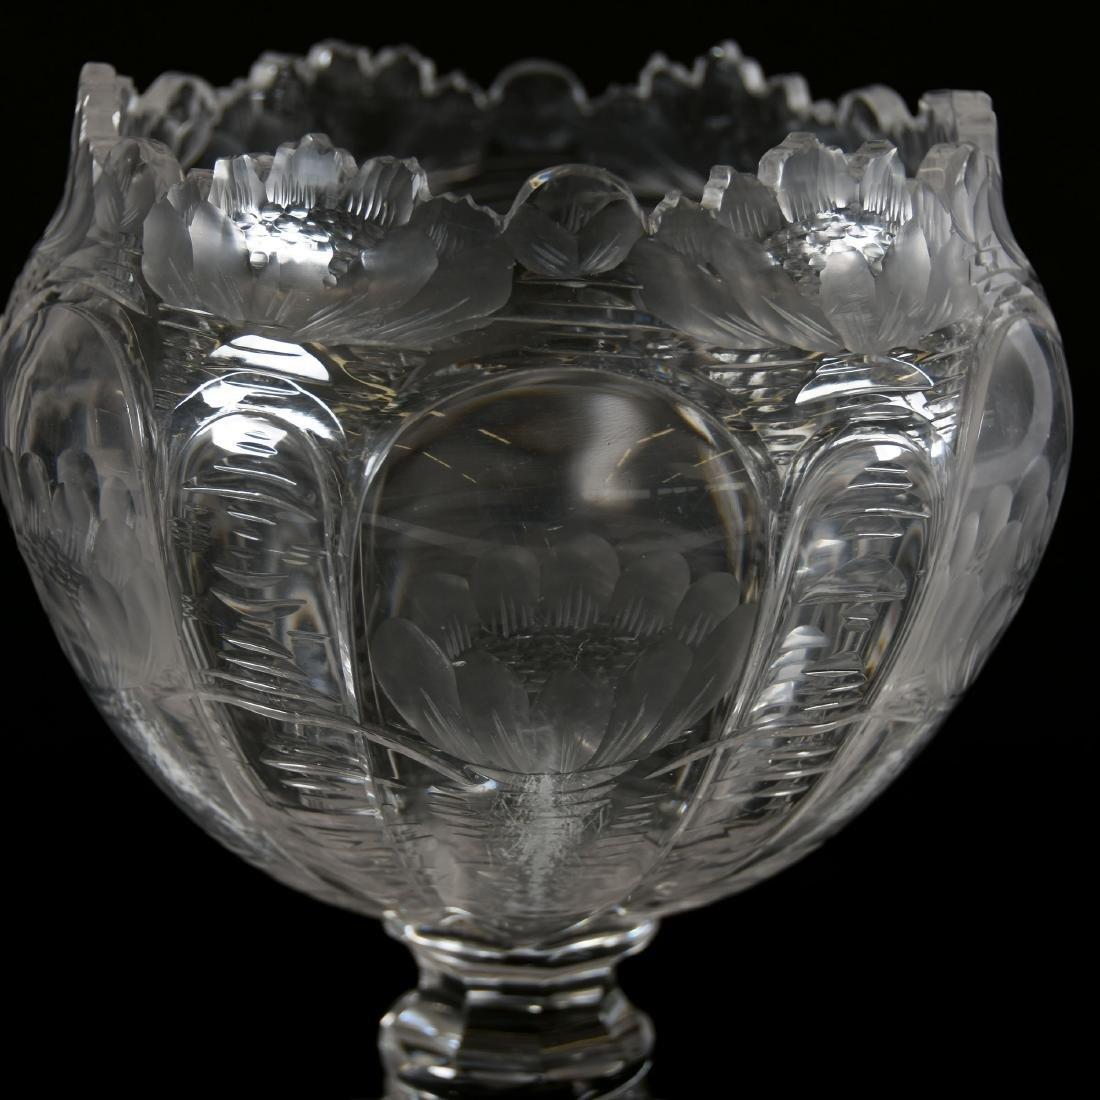 Pedestal Rose Bowl, Engraved Waterlily Design - 4